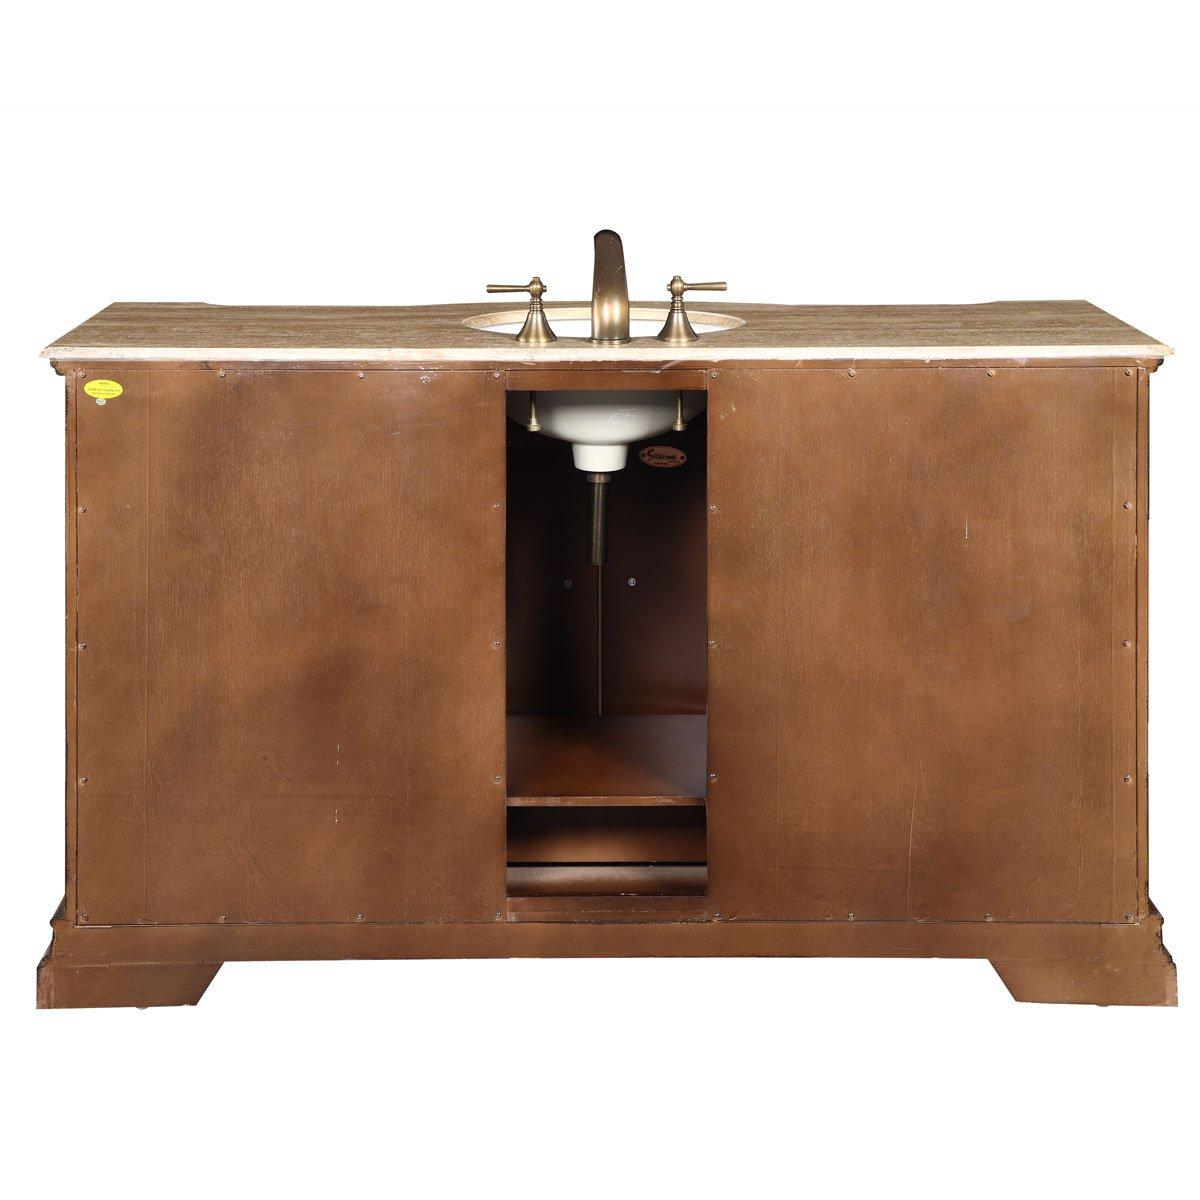 Inch travertine top single sink bathroom vanity lavatory bath cabinet - Amazon Com Silkroad Exclusive Travertine Top Single Sink Bathroom Vanity With Furniture Cabinet 60 Inch Home Kitchen